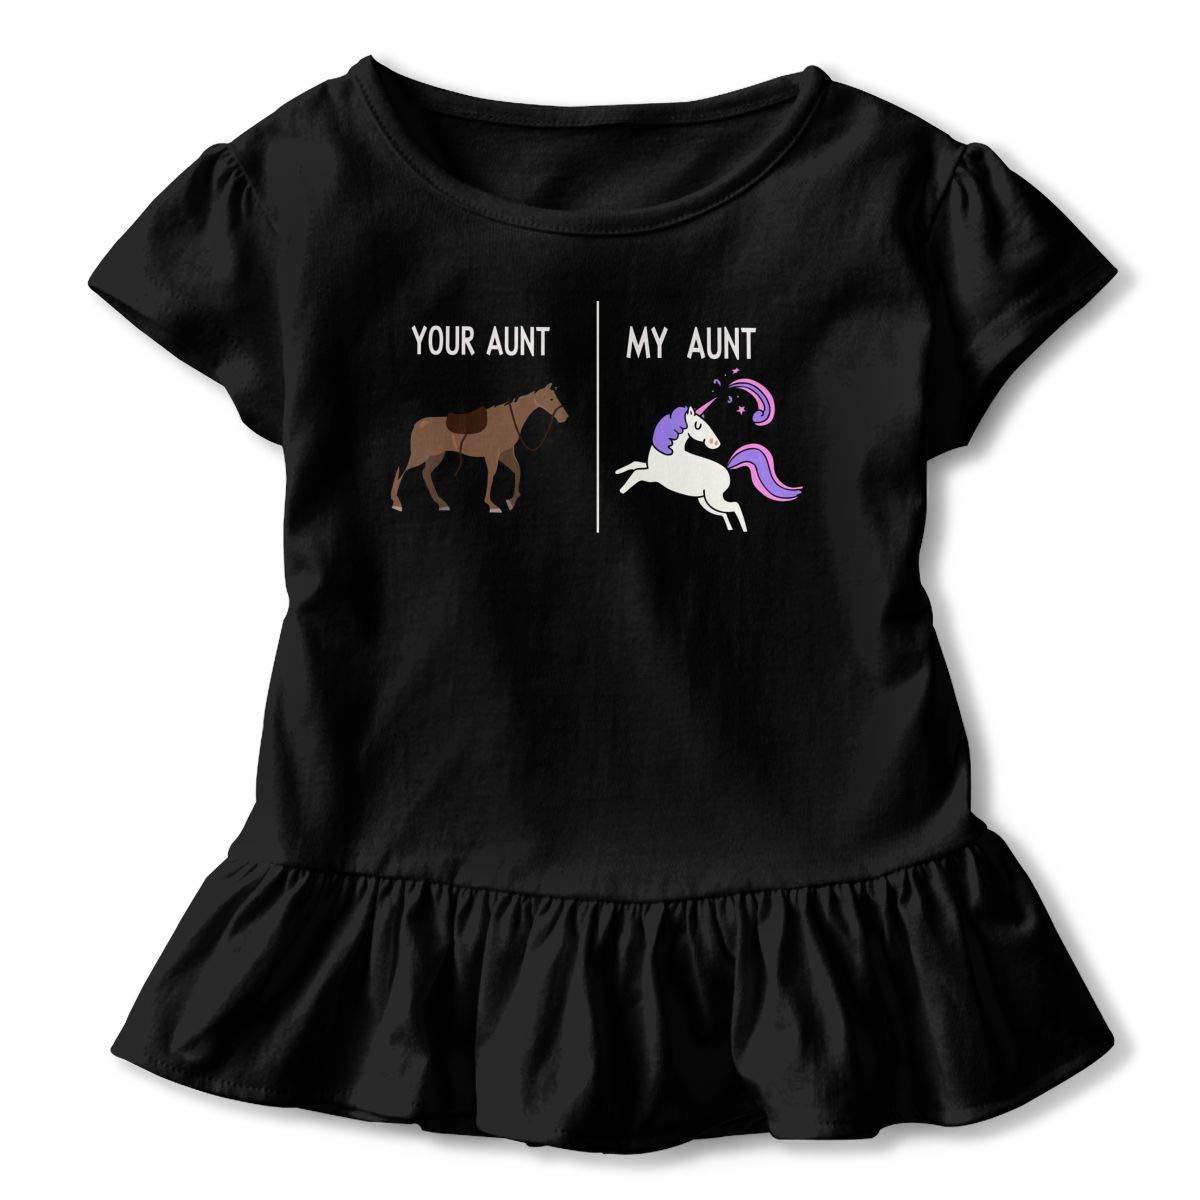 Your Aunt My Aunt Horse Unicorn Toddler Girls T Shirt Kids Cotton Short Sleeve Ruffle Tee